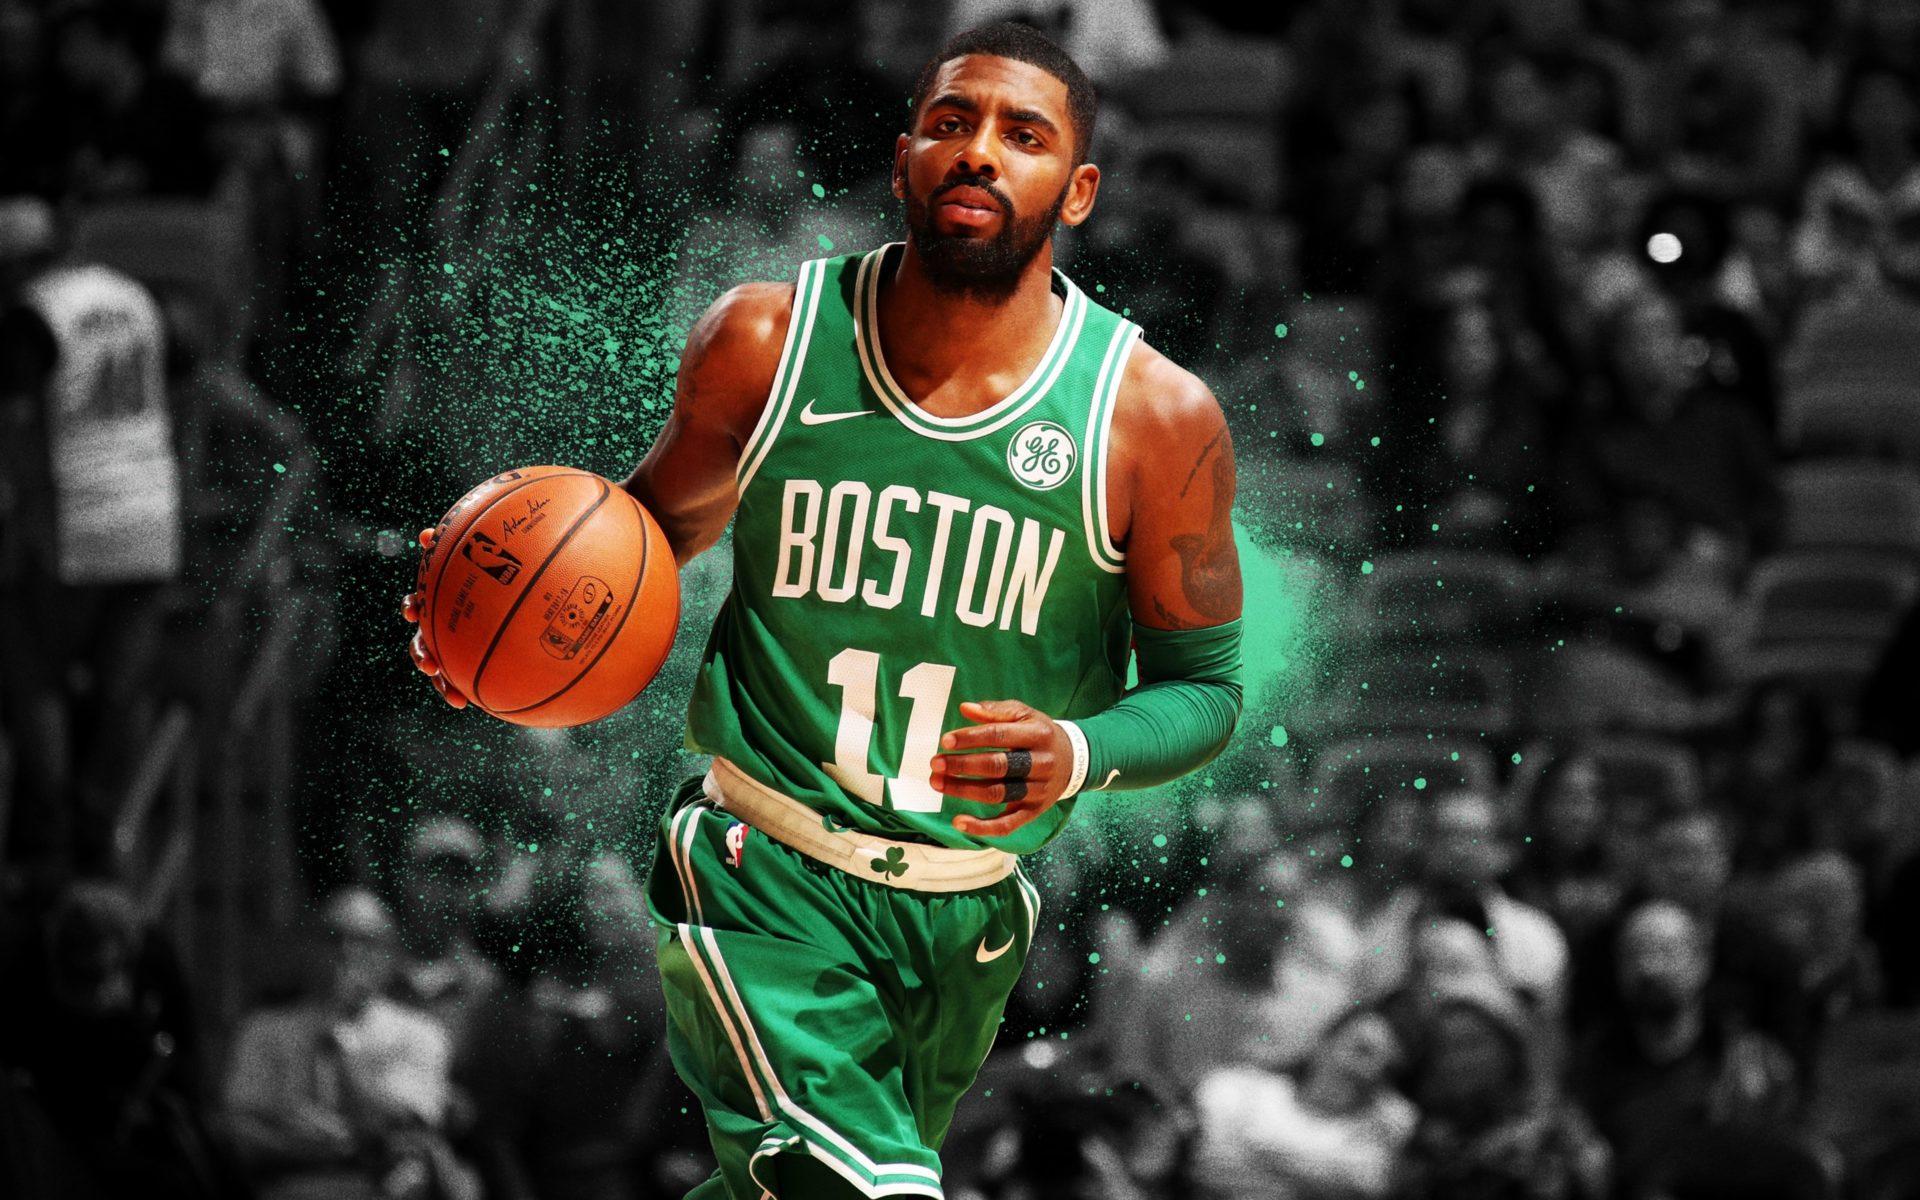 20+] Kyrie Irving Boston Celtics Wallpapers on WallpaperSafari